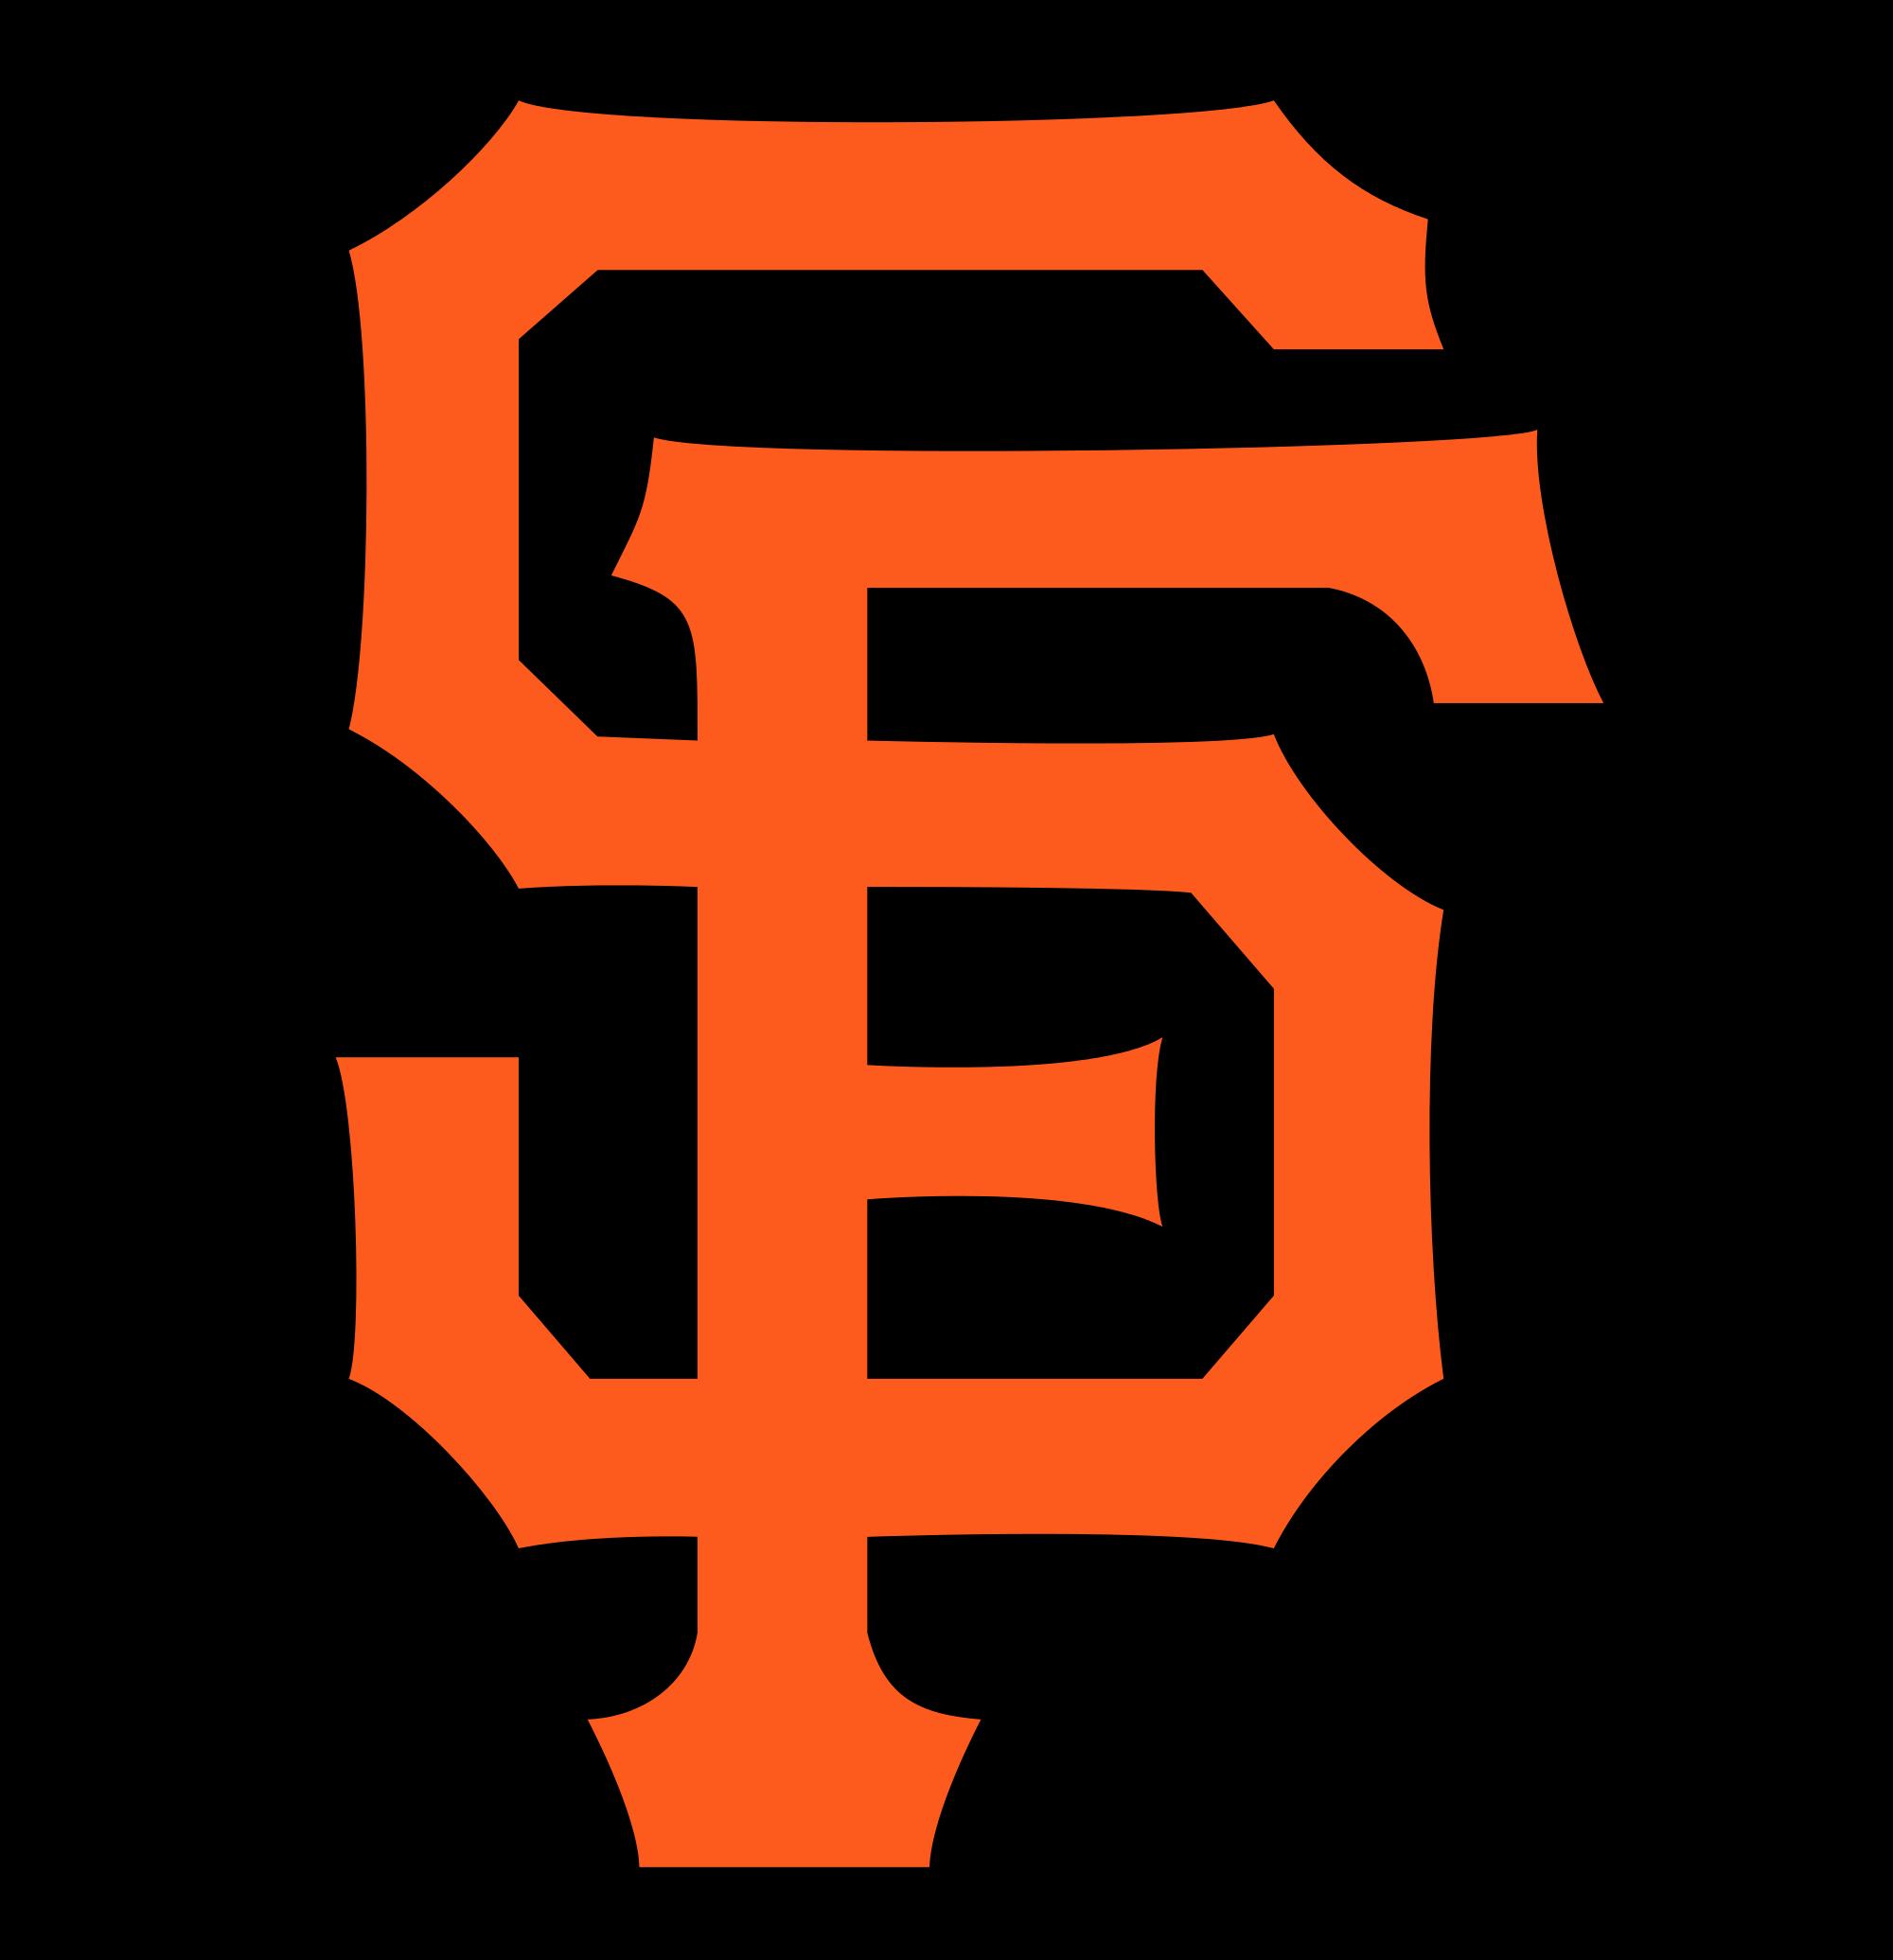 San Francisco Giants Wallpapers Sports Hq San Francisco Giants